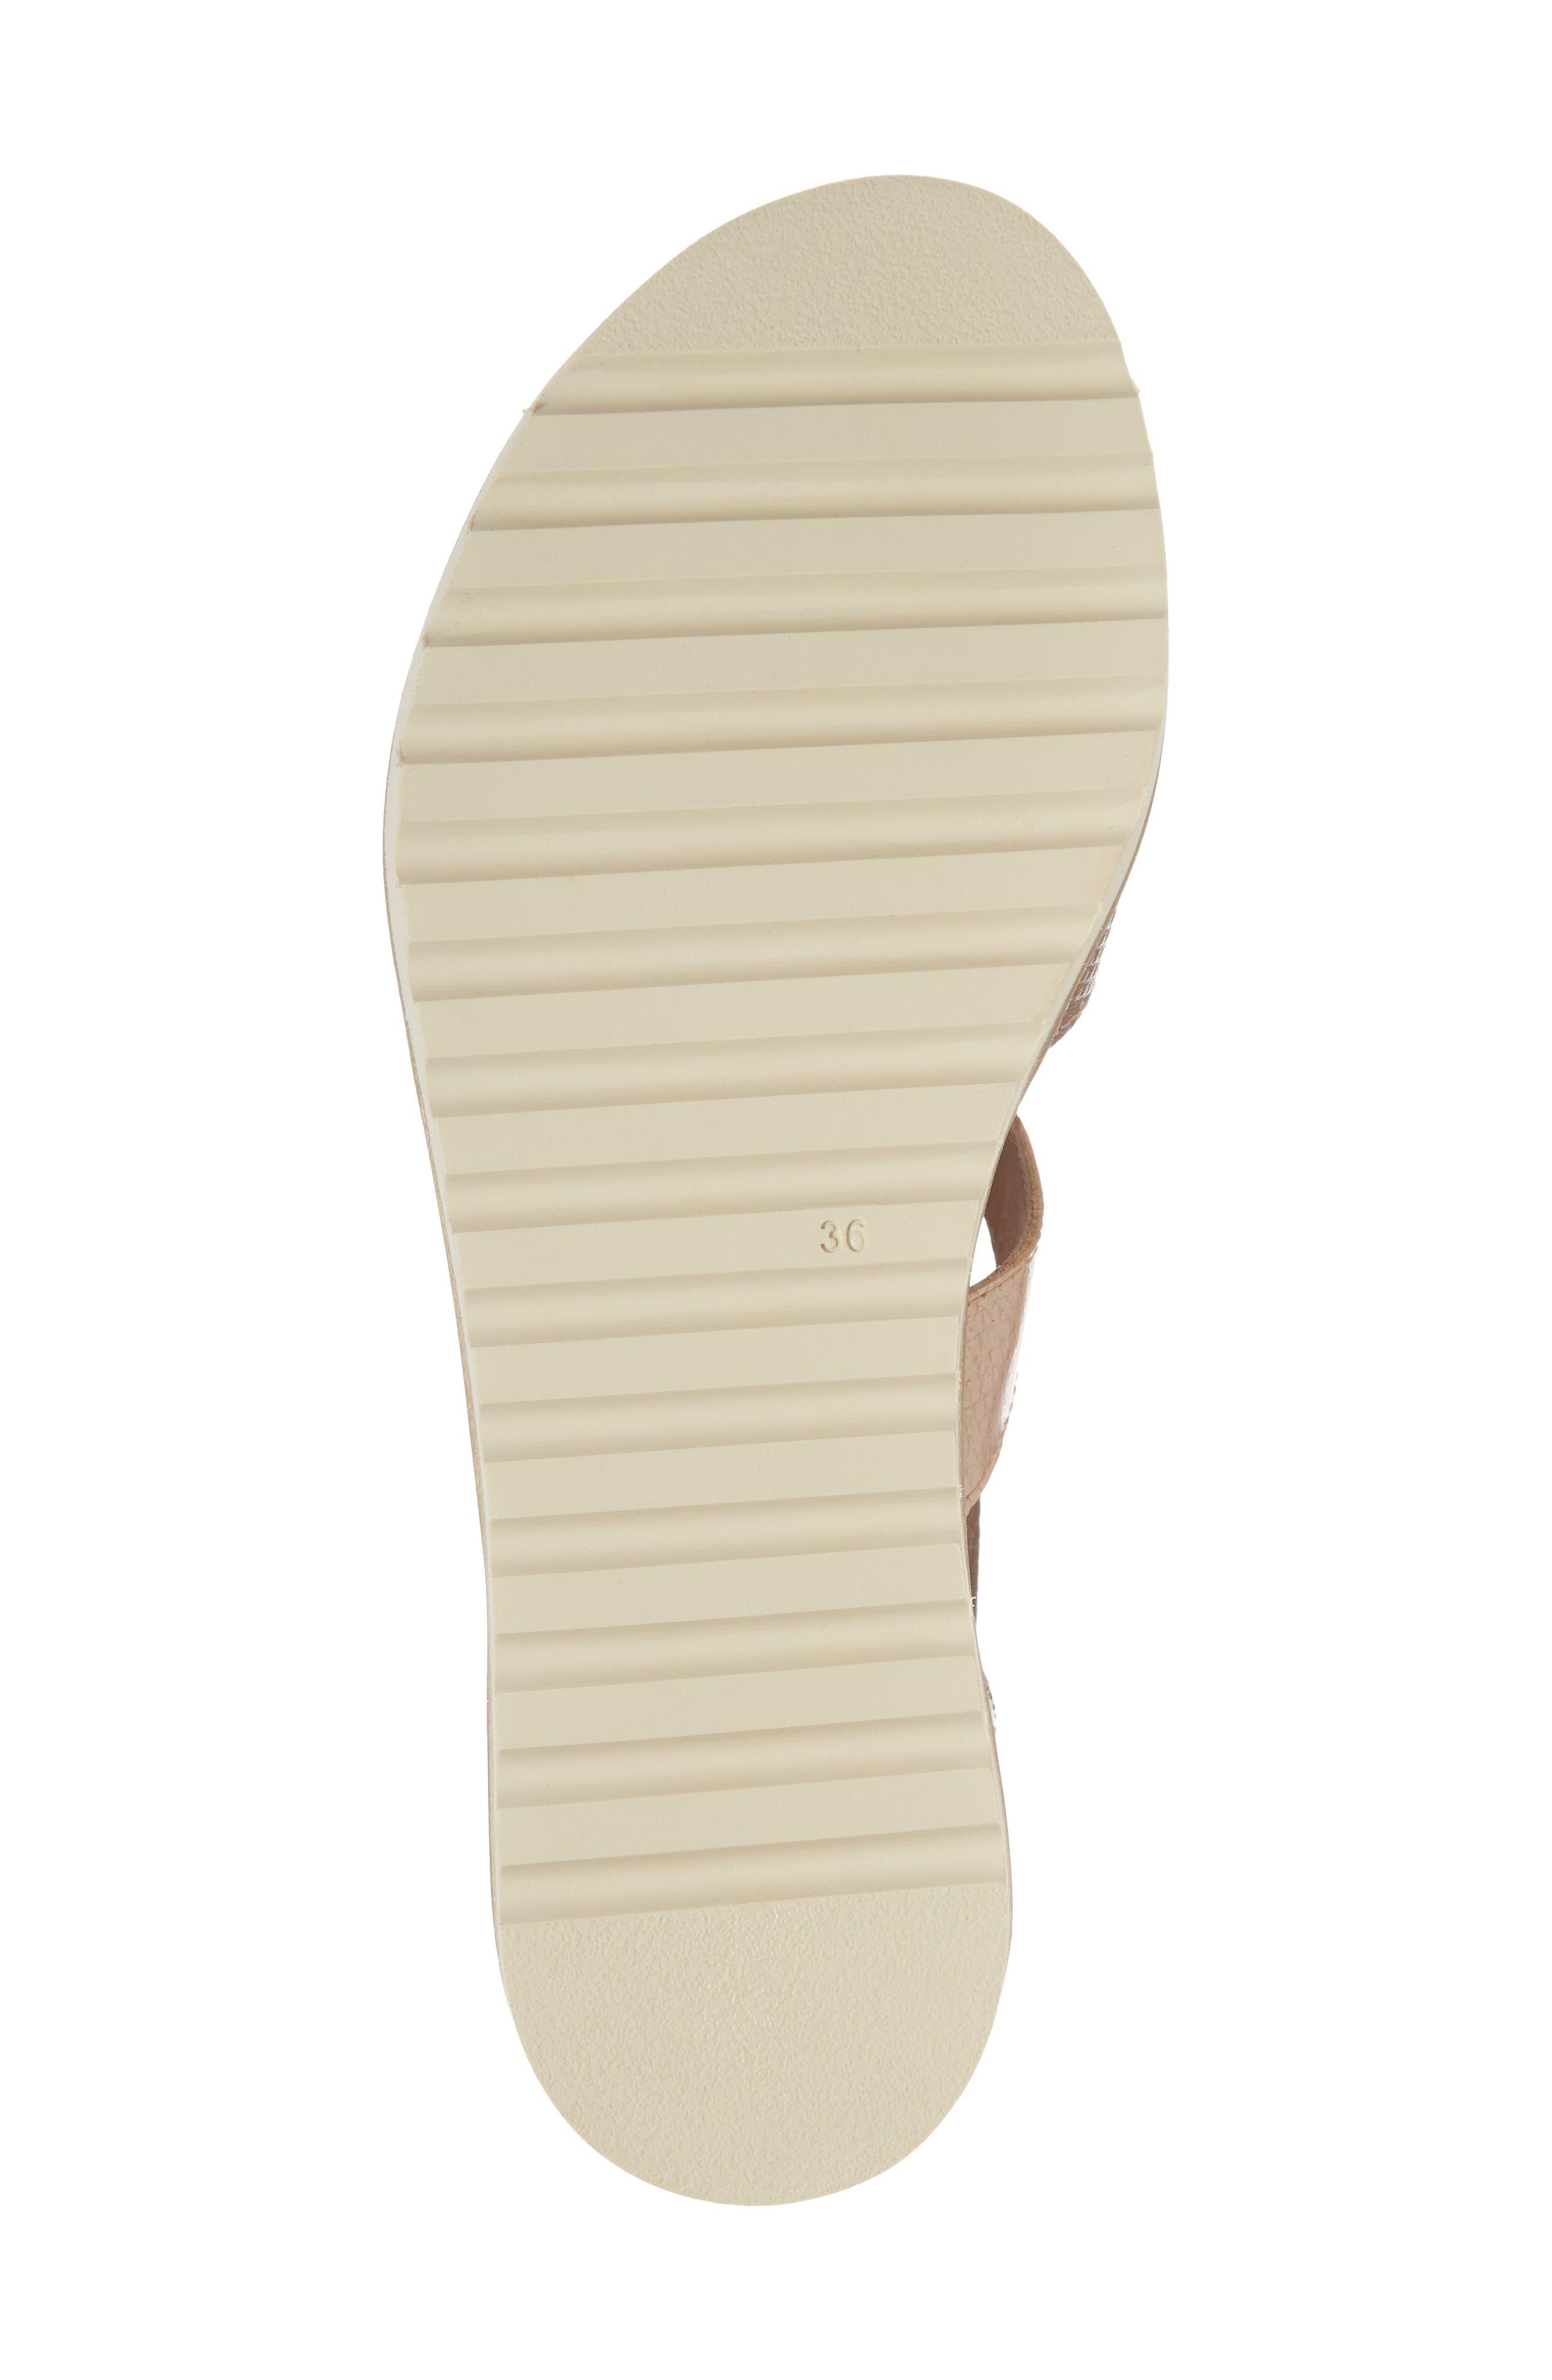 Alcudia Sandal,                             Alternate thumbnail 6, color,                             Cuero Leather